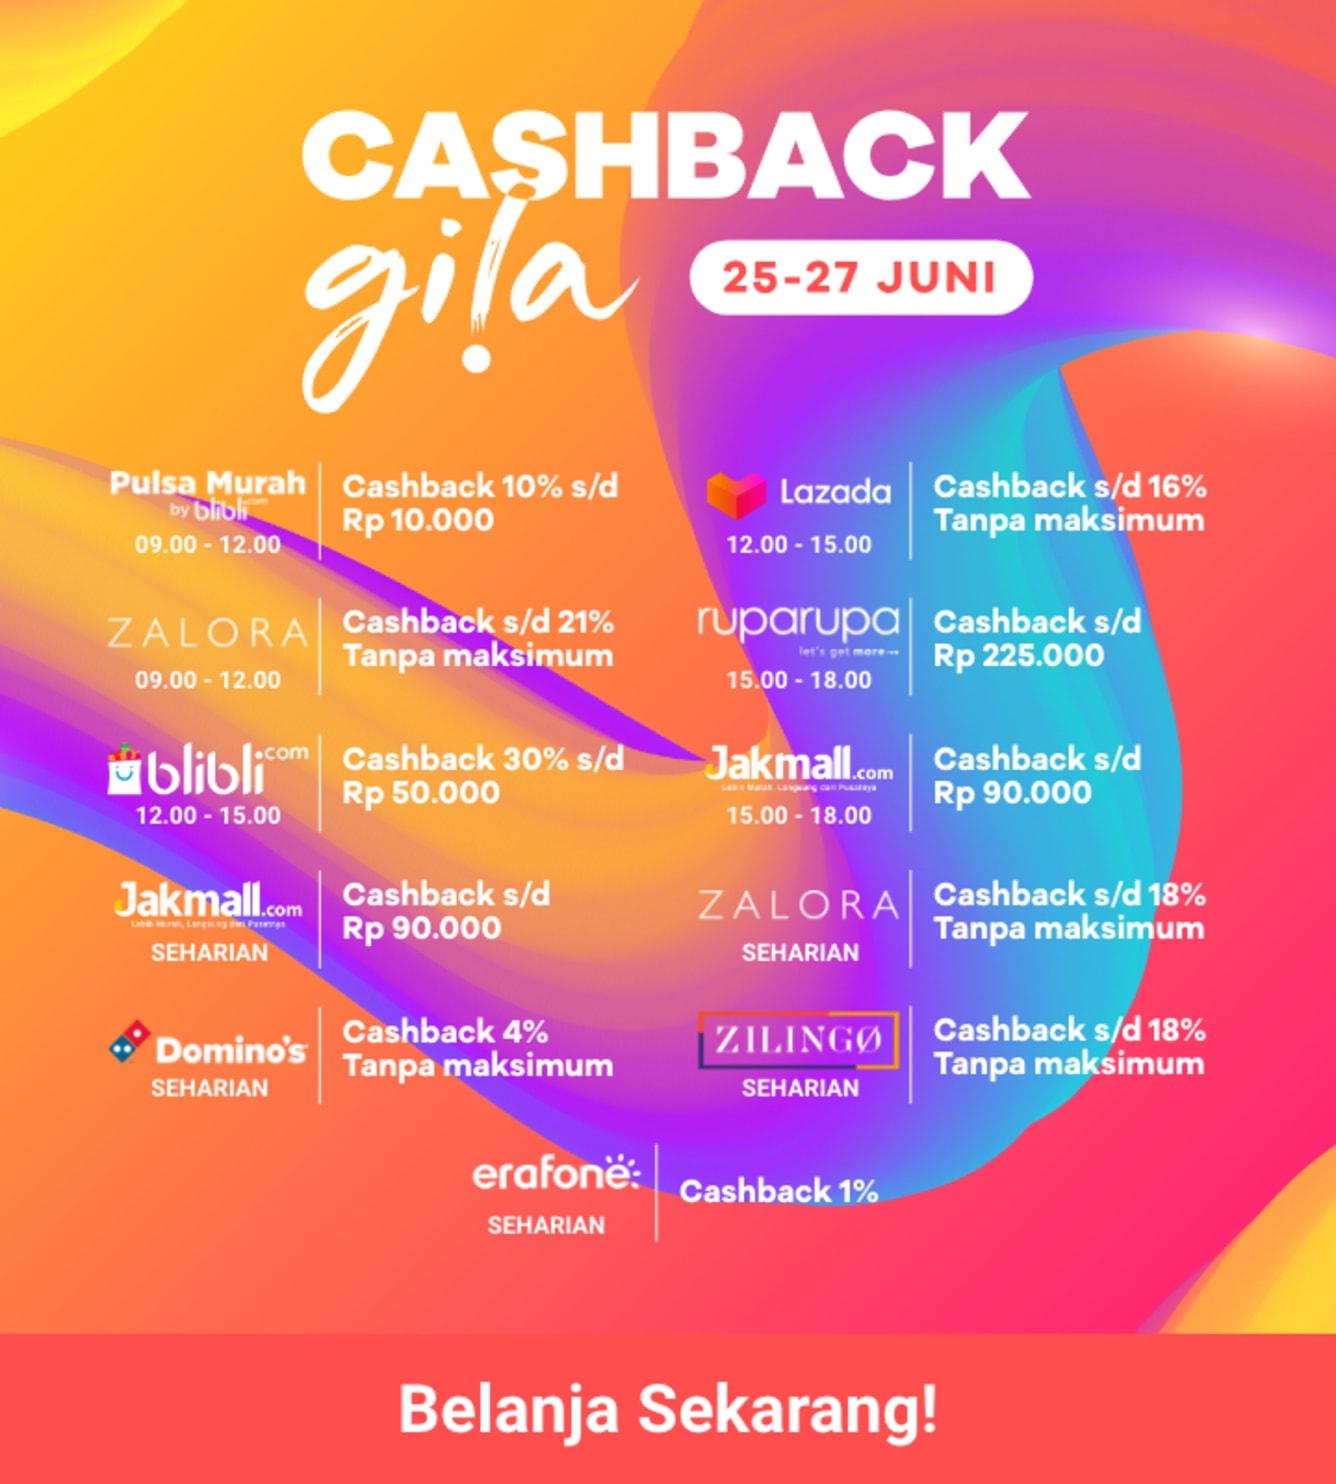 Week 26 - Schedule Cashback Gila